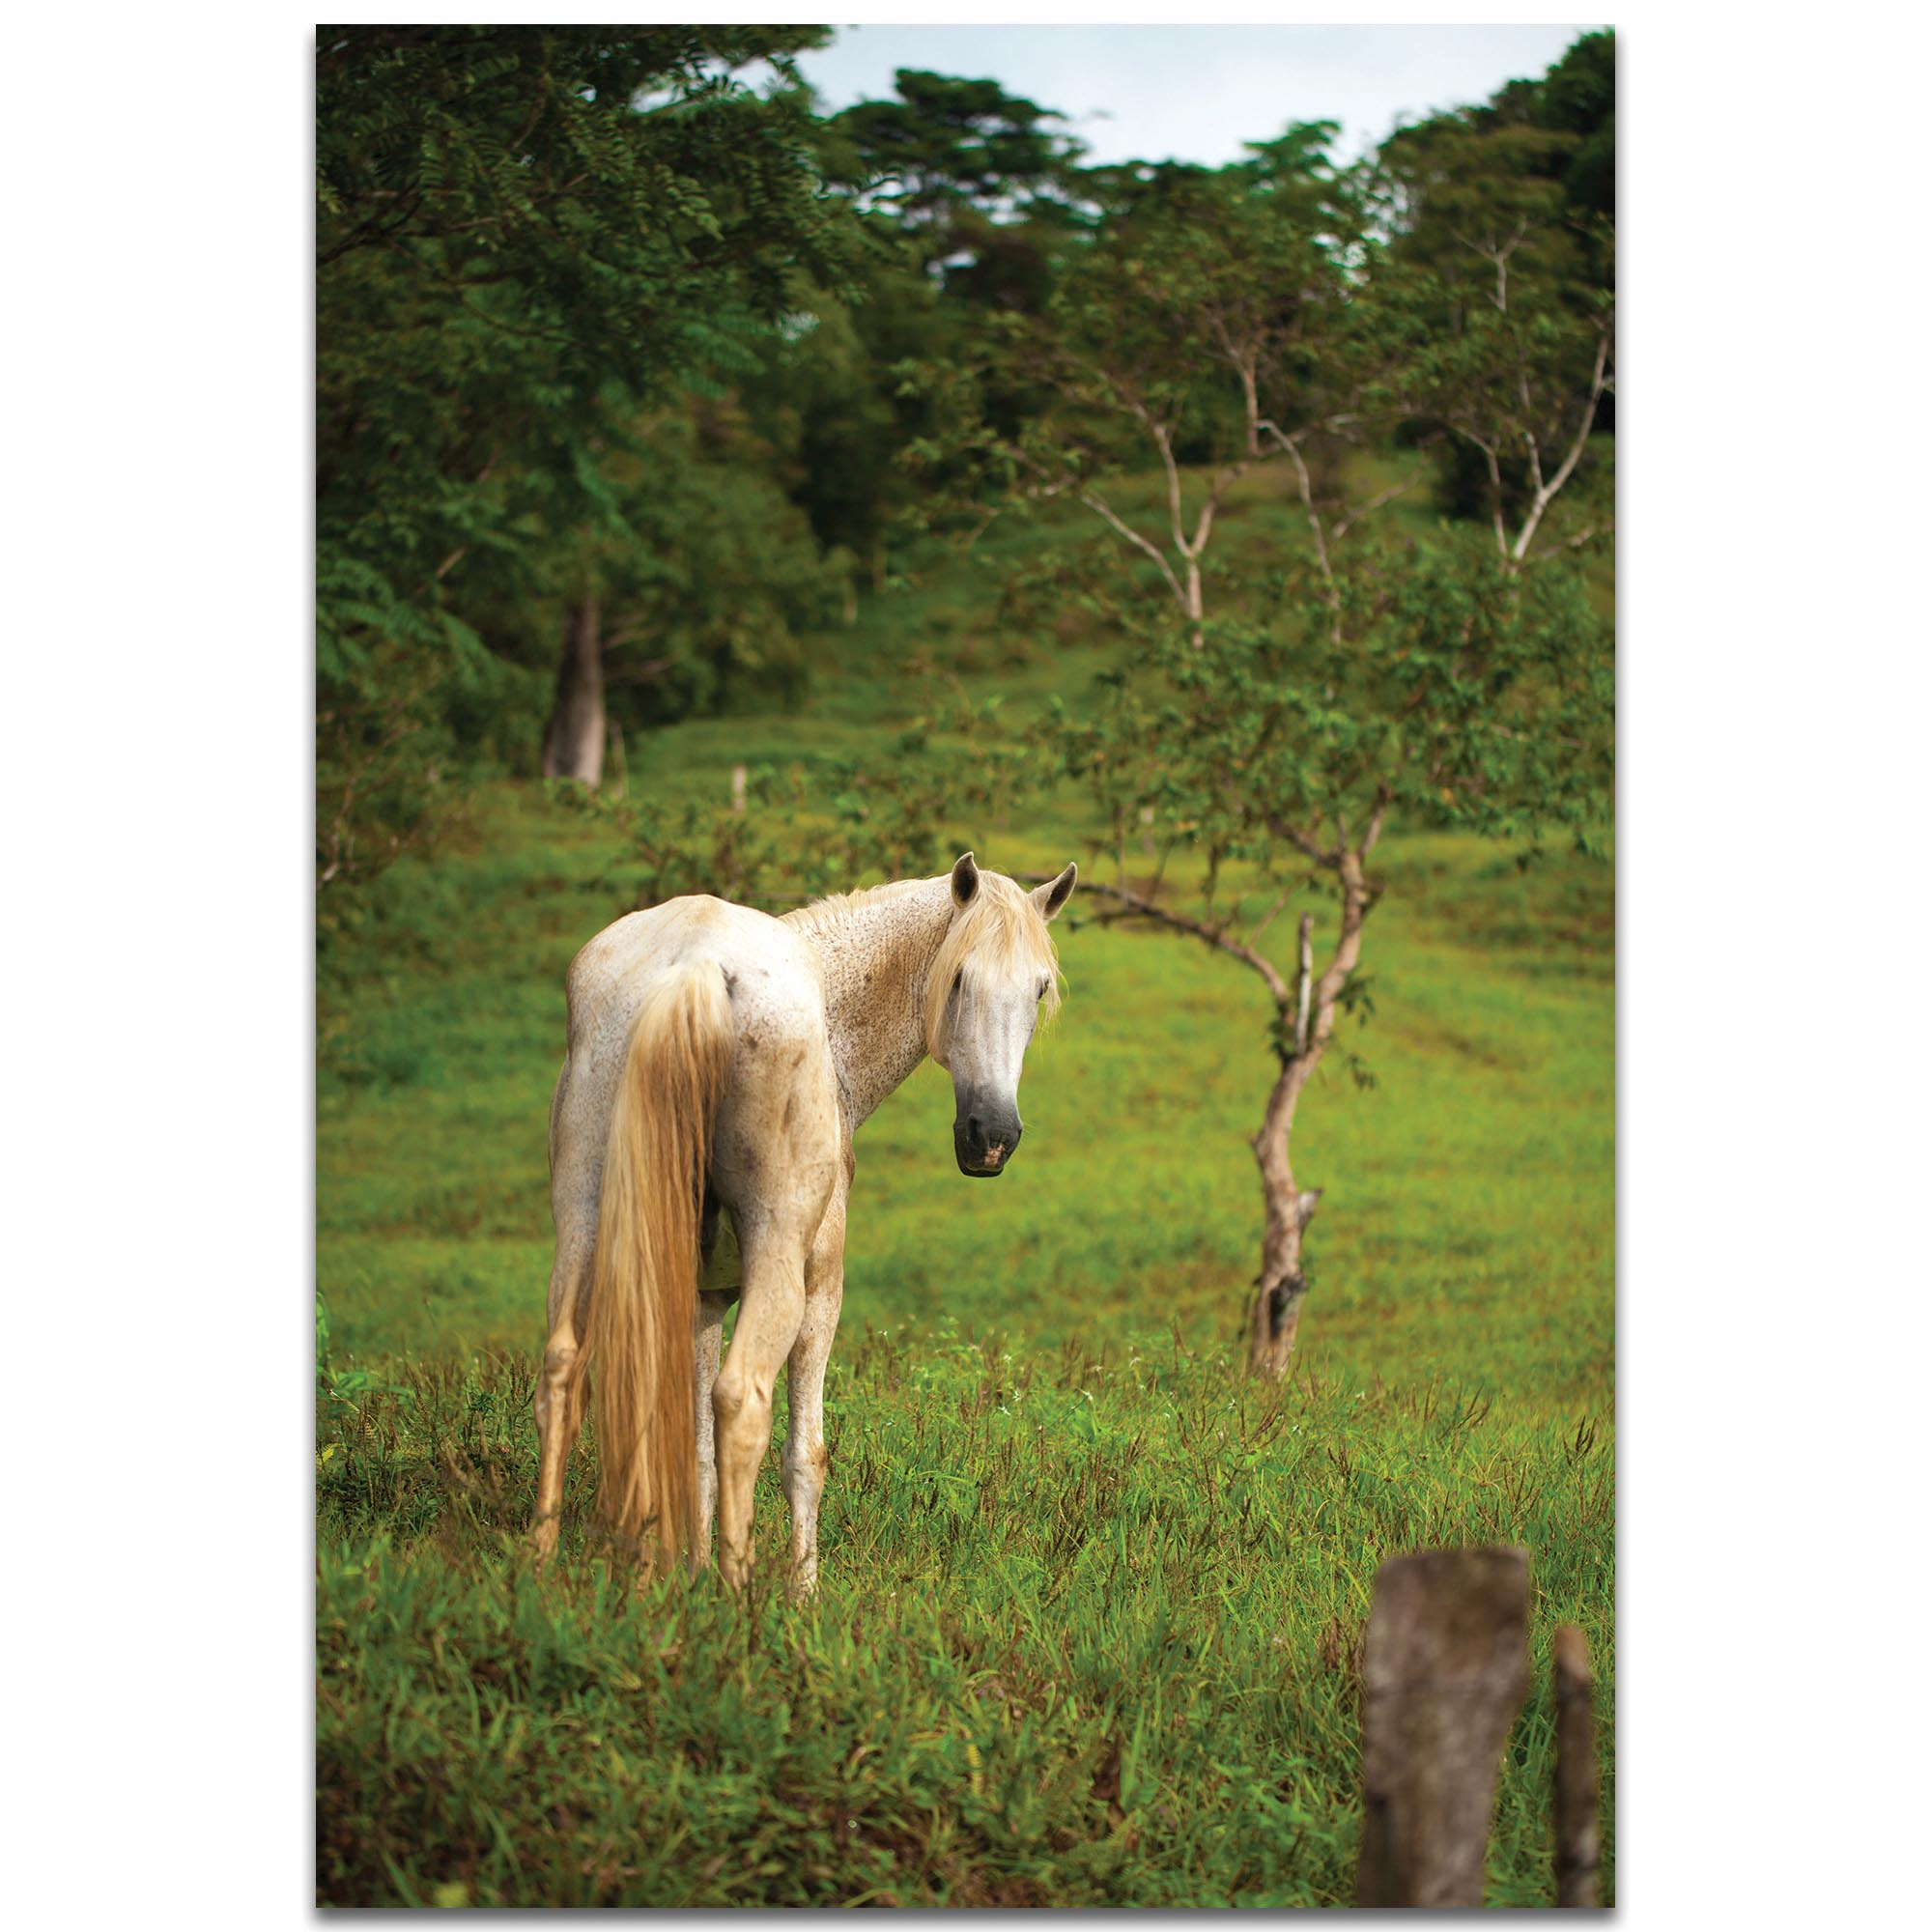 Western Wall Art 'Equine Invitation' - Horses Decor on Metal or Plexiglass